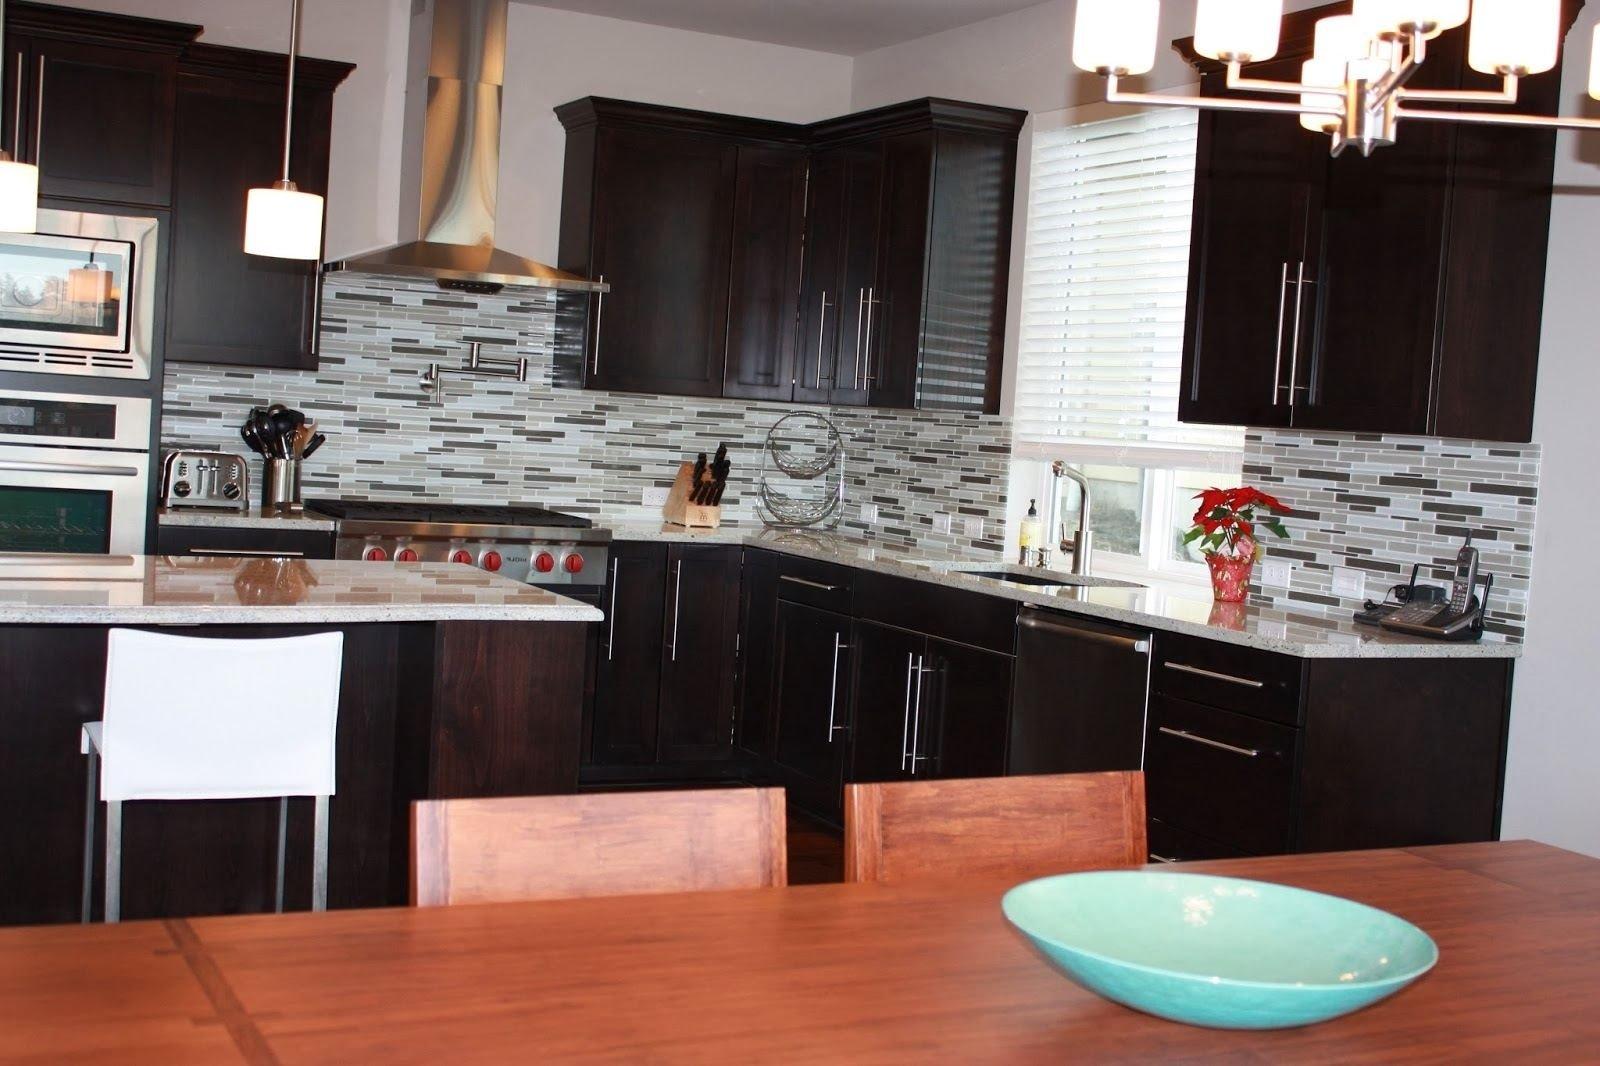 10 Attractive Backsplash Ideas For Cherry Cabinets kitchen backsplash ideas with cherry cabinets wooden varnished 2020